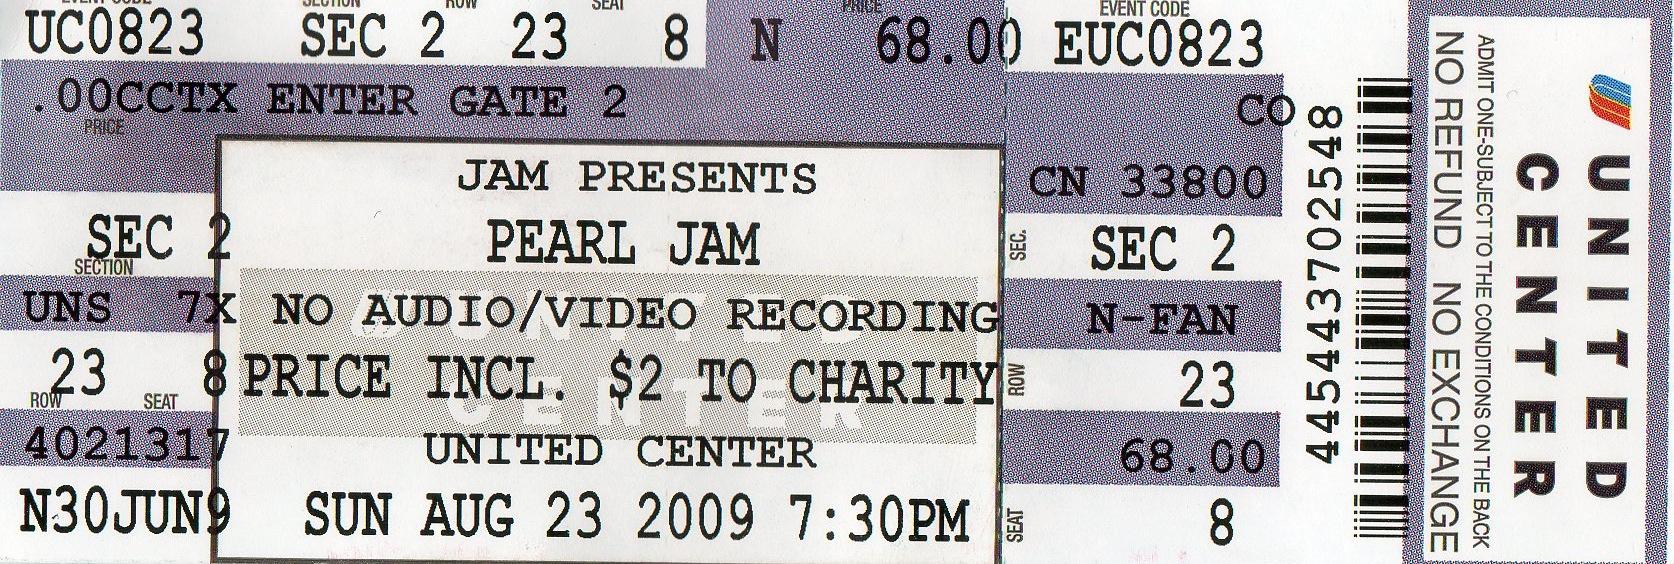 pearl jam united center 2009